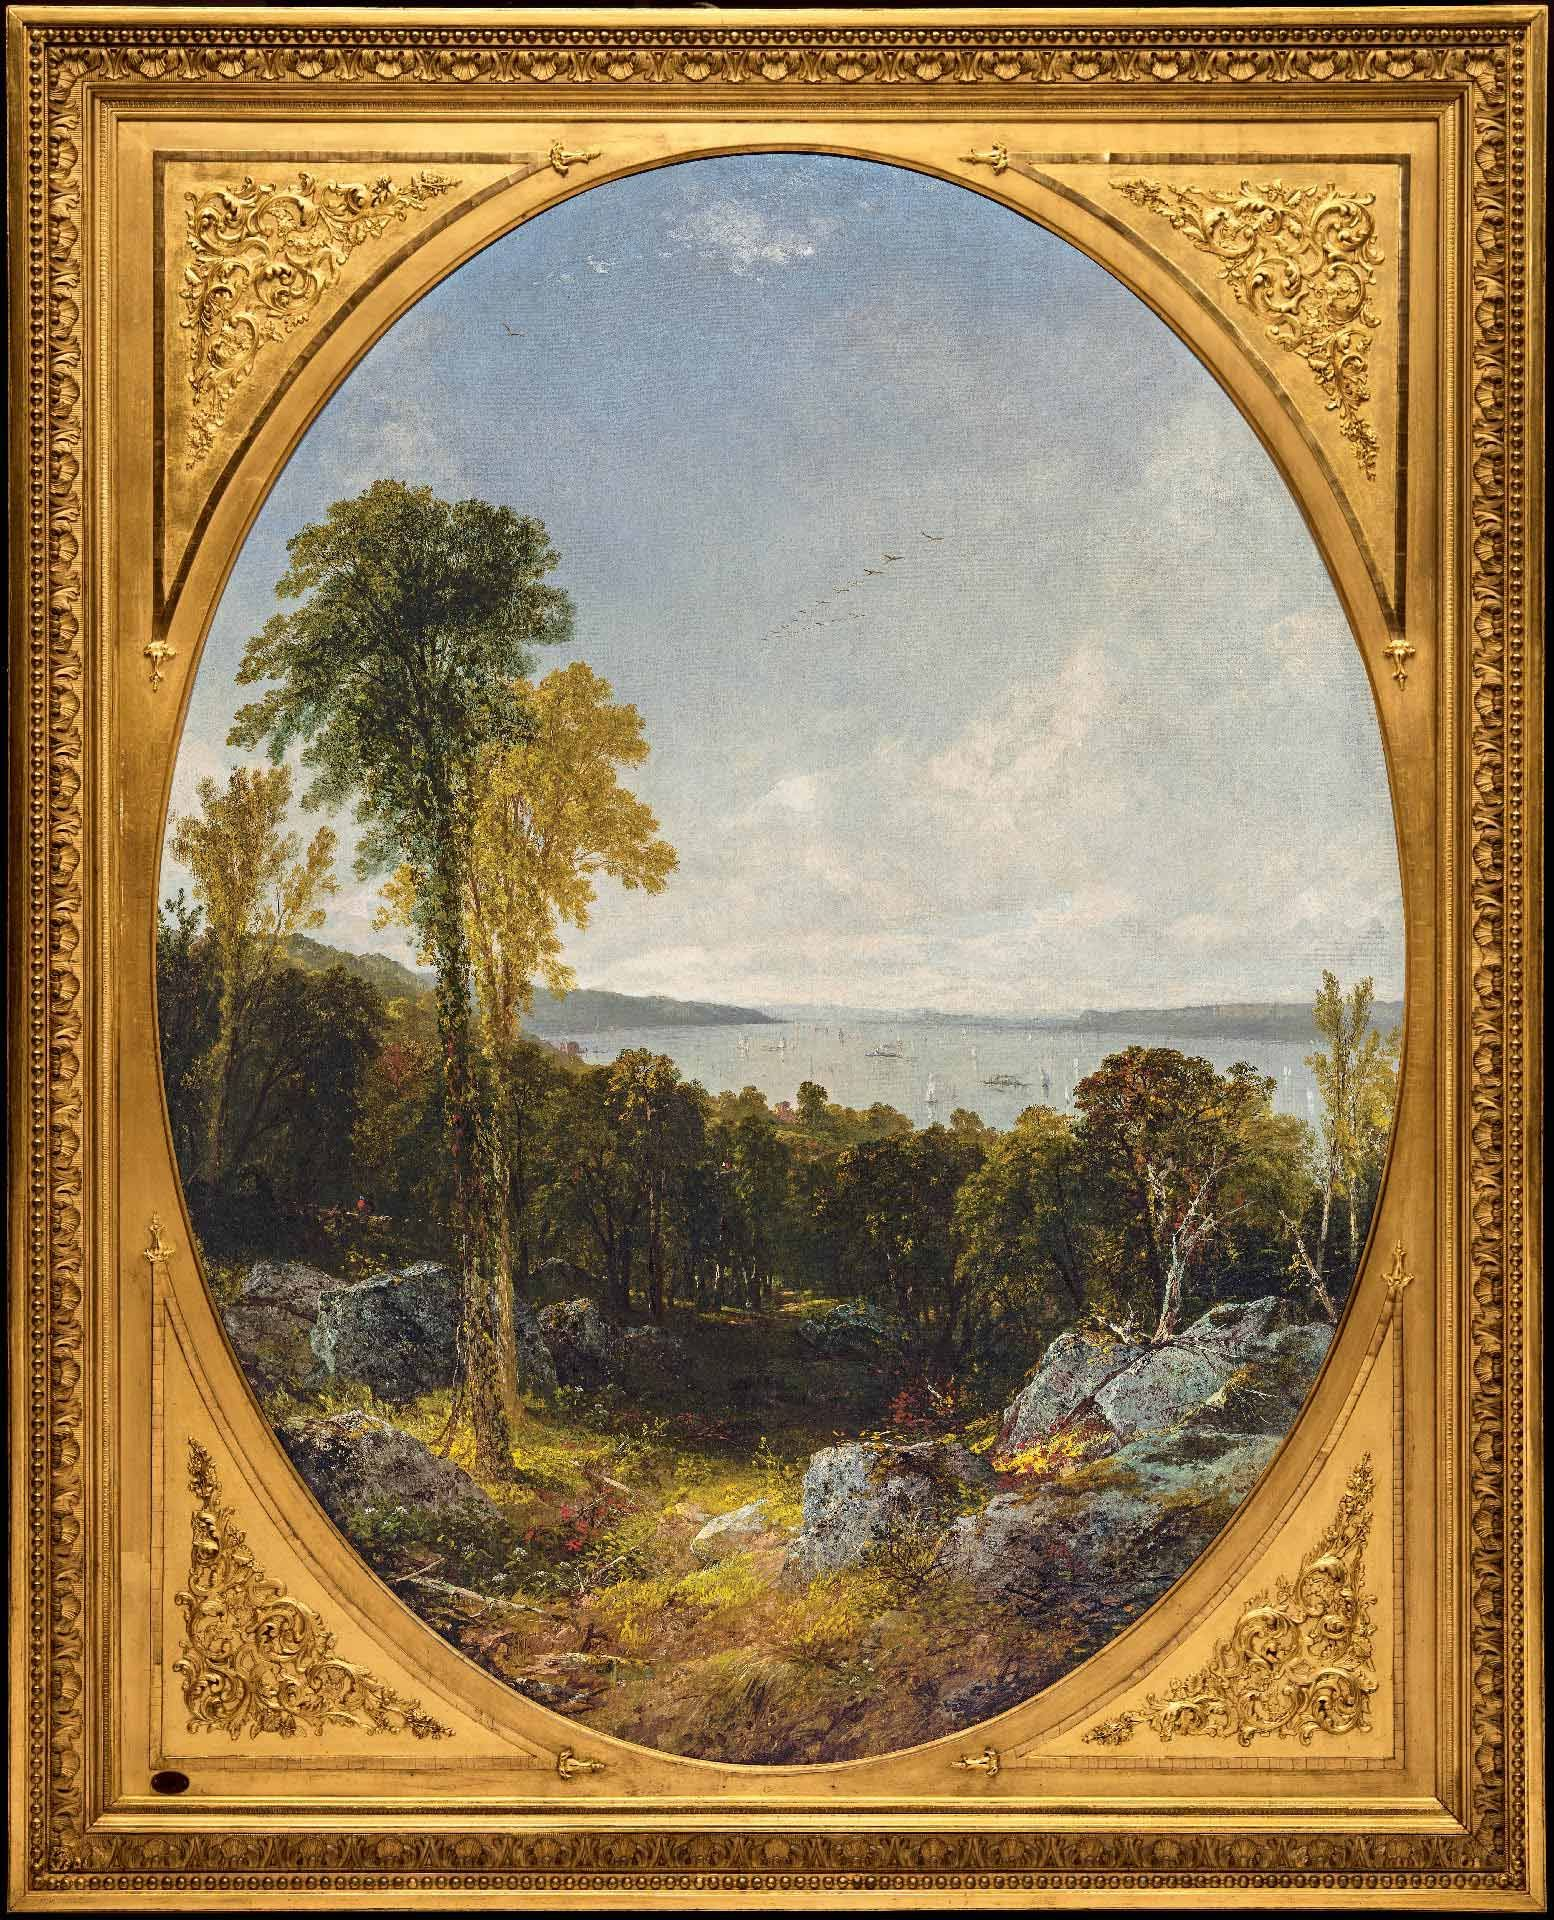 John Frederick Kensett, On the Hudson, 1855, oil on canvas, 154.3 x 119.7 cm. MMFA, gift of the family of Dr. F. Wolferstan Thomas